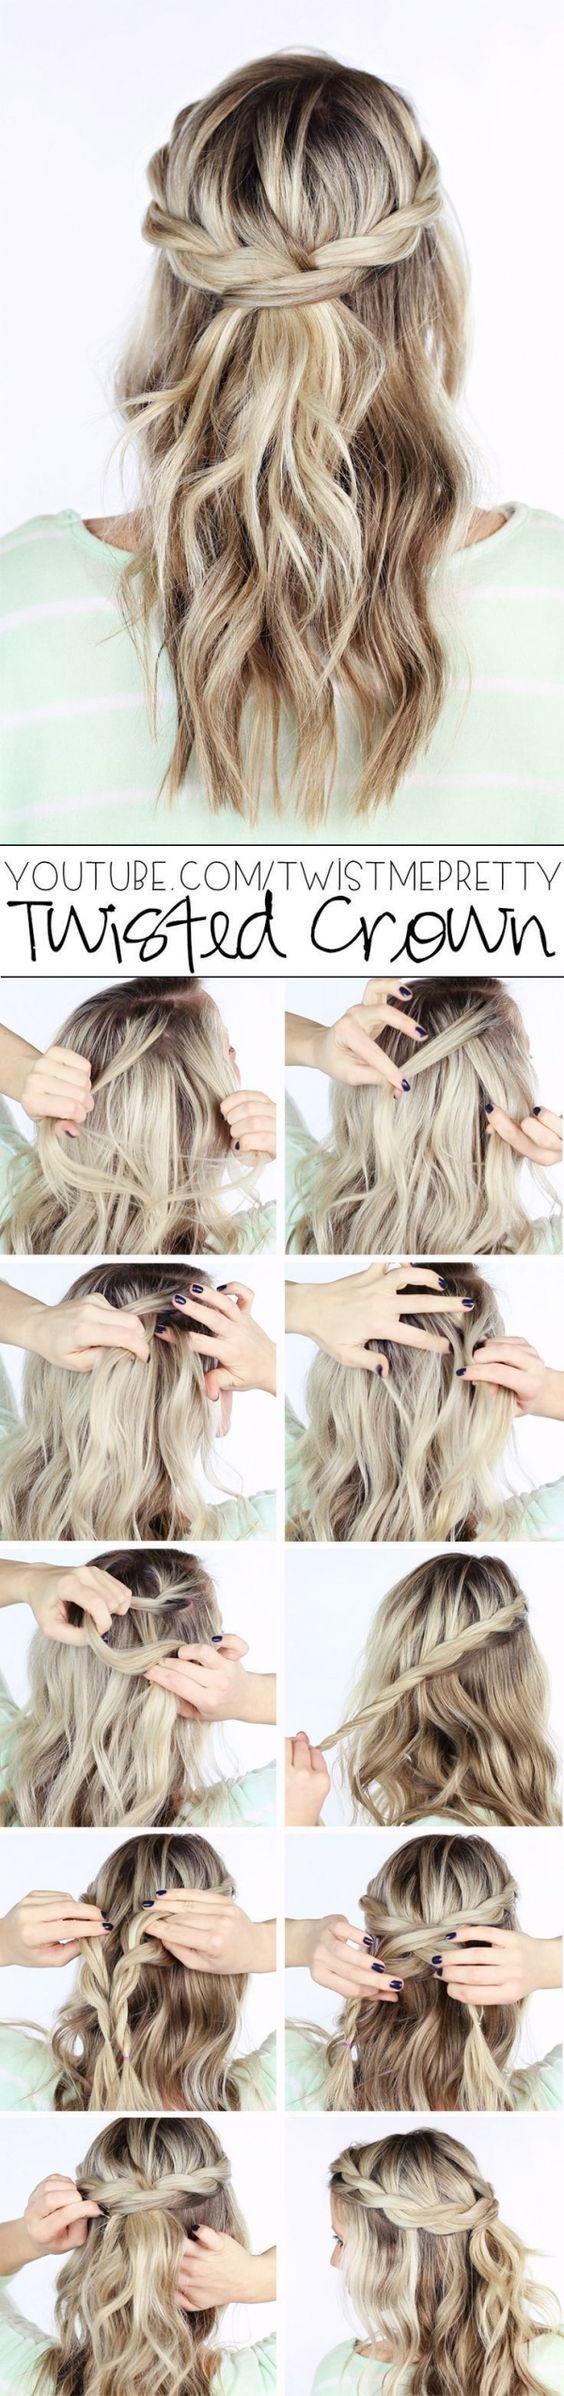 22 half up half down hairstyles (easy step by step hair